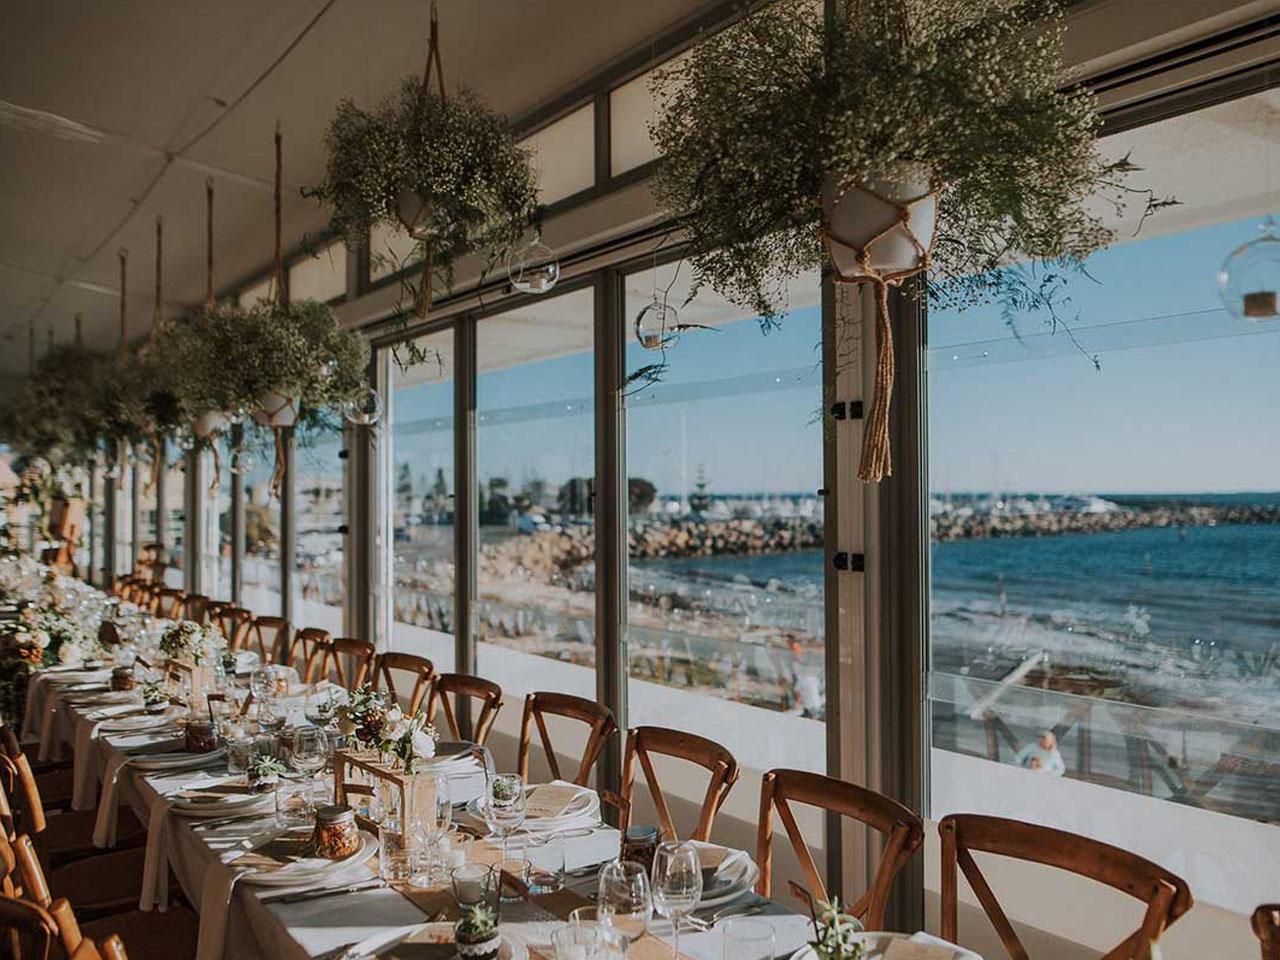 empty table setup at wedding venue overlooking beach